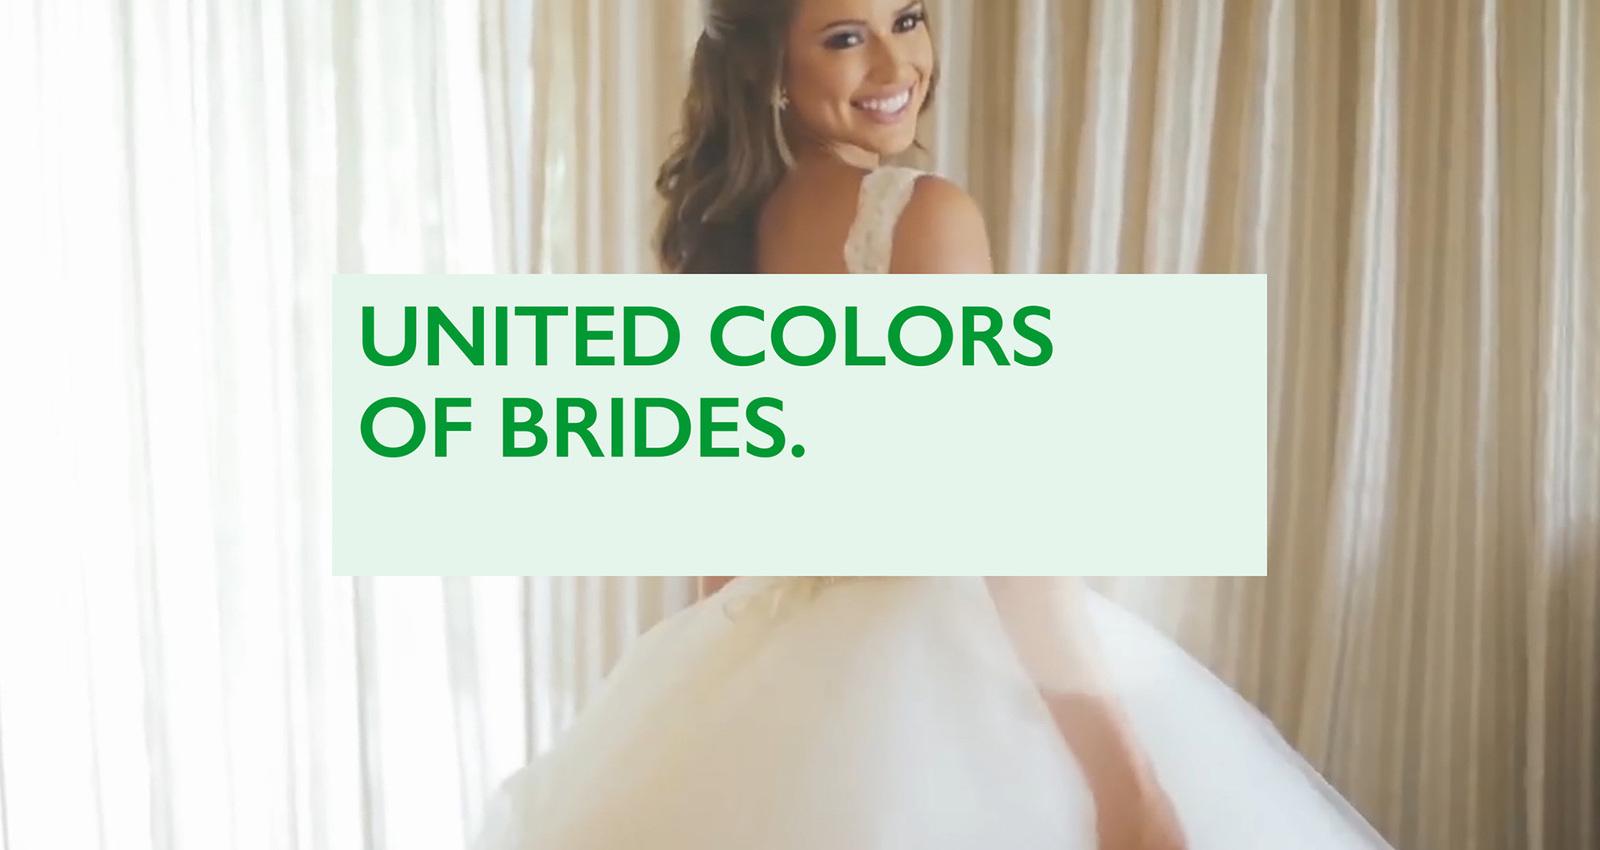 United Colors of Brides